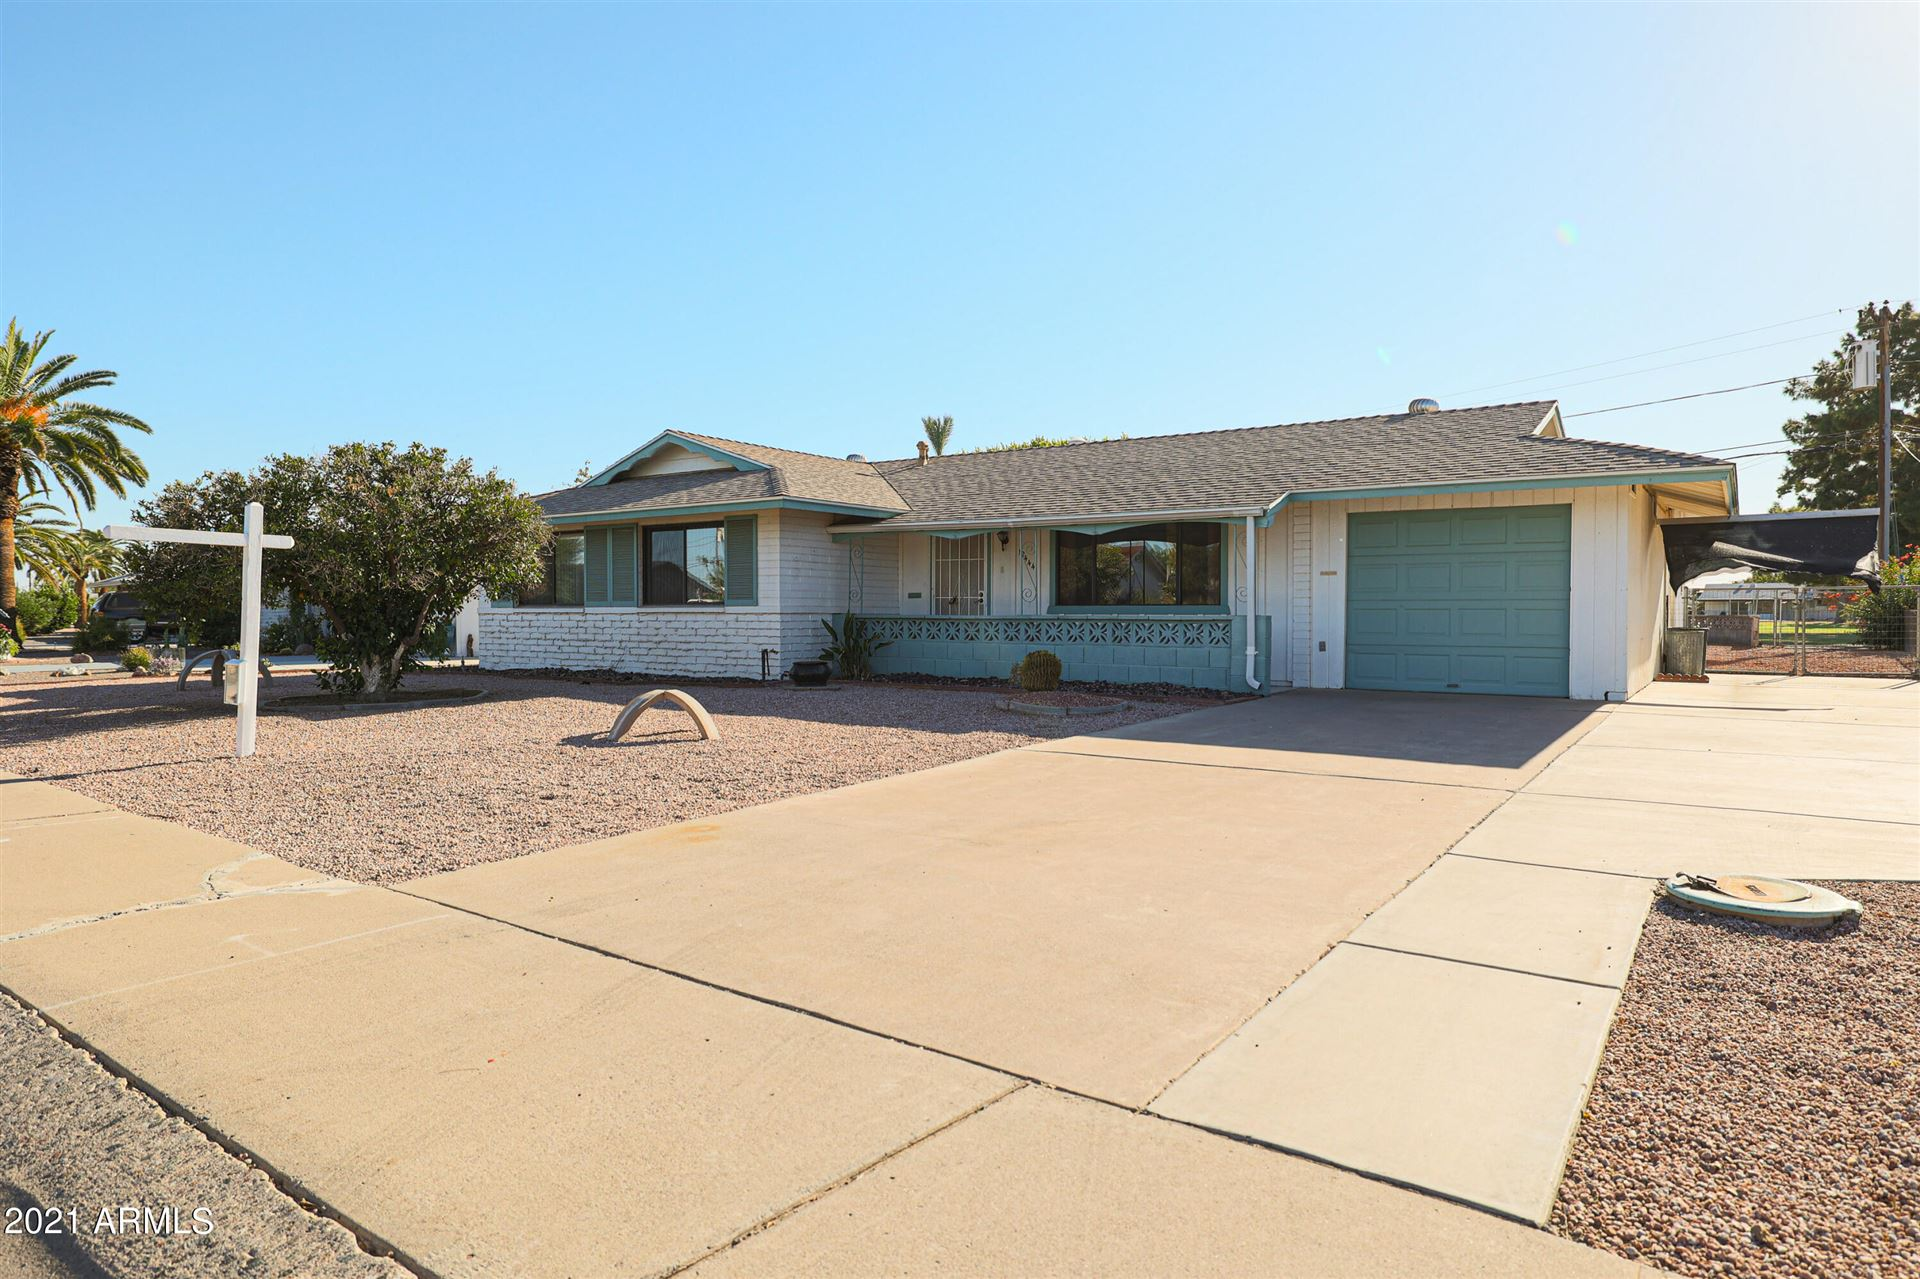 Photo of 12444 N PEBBLE BEACH Drive, Sun City, AZ 85351 (MLS # 6307202)